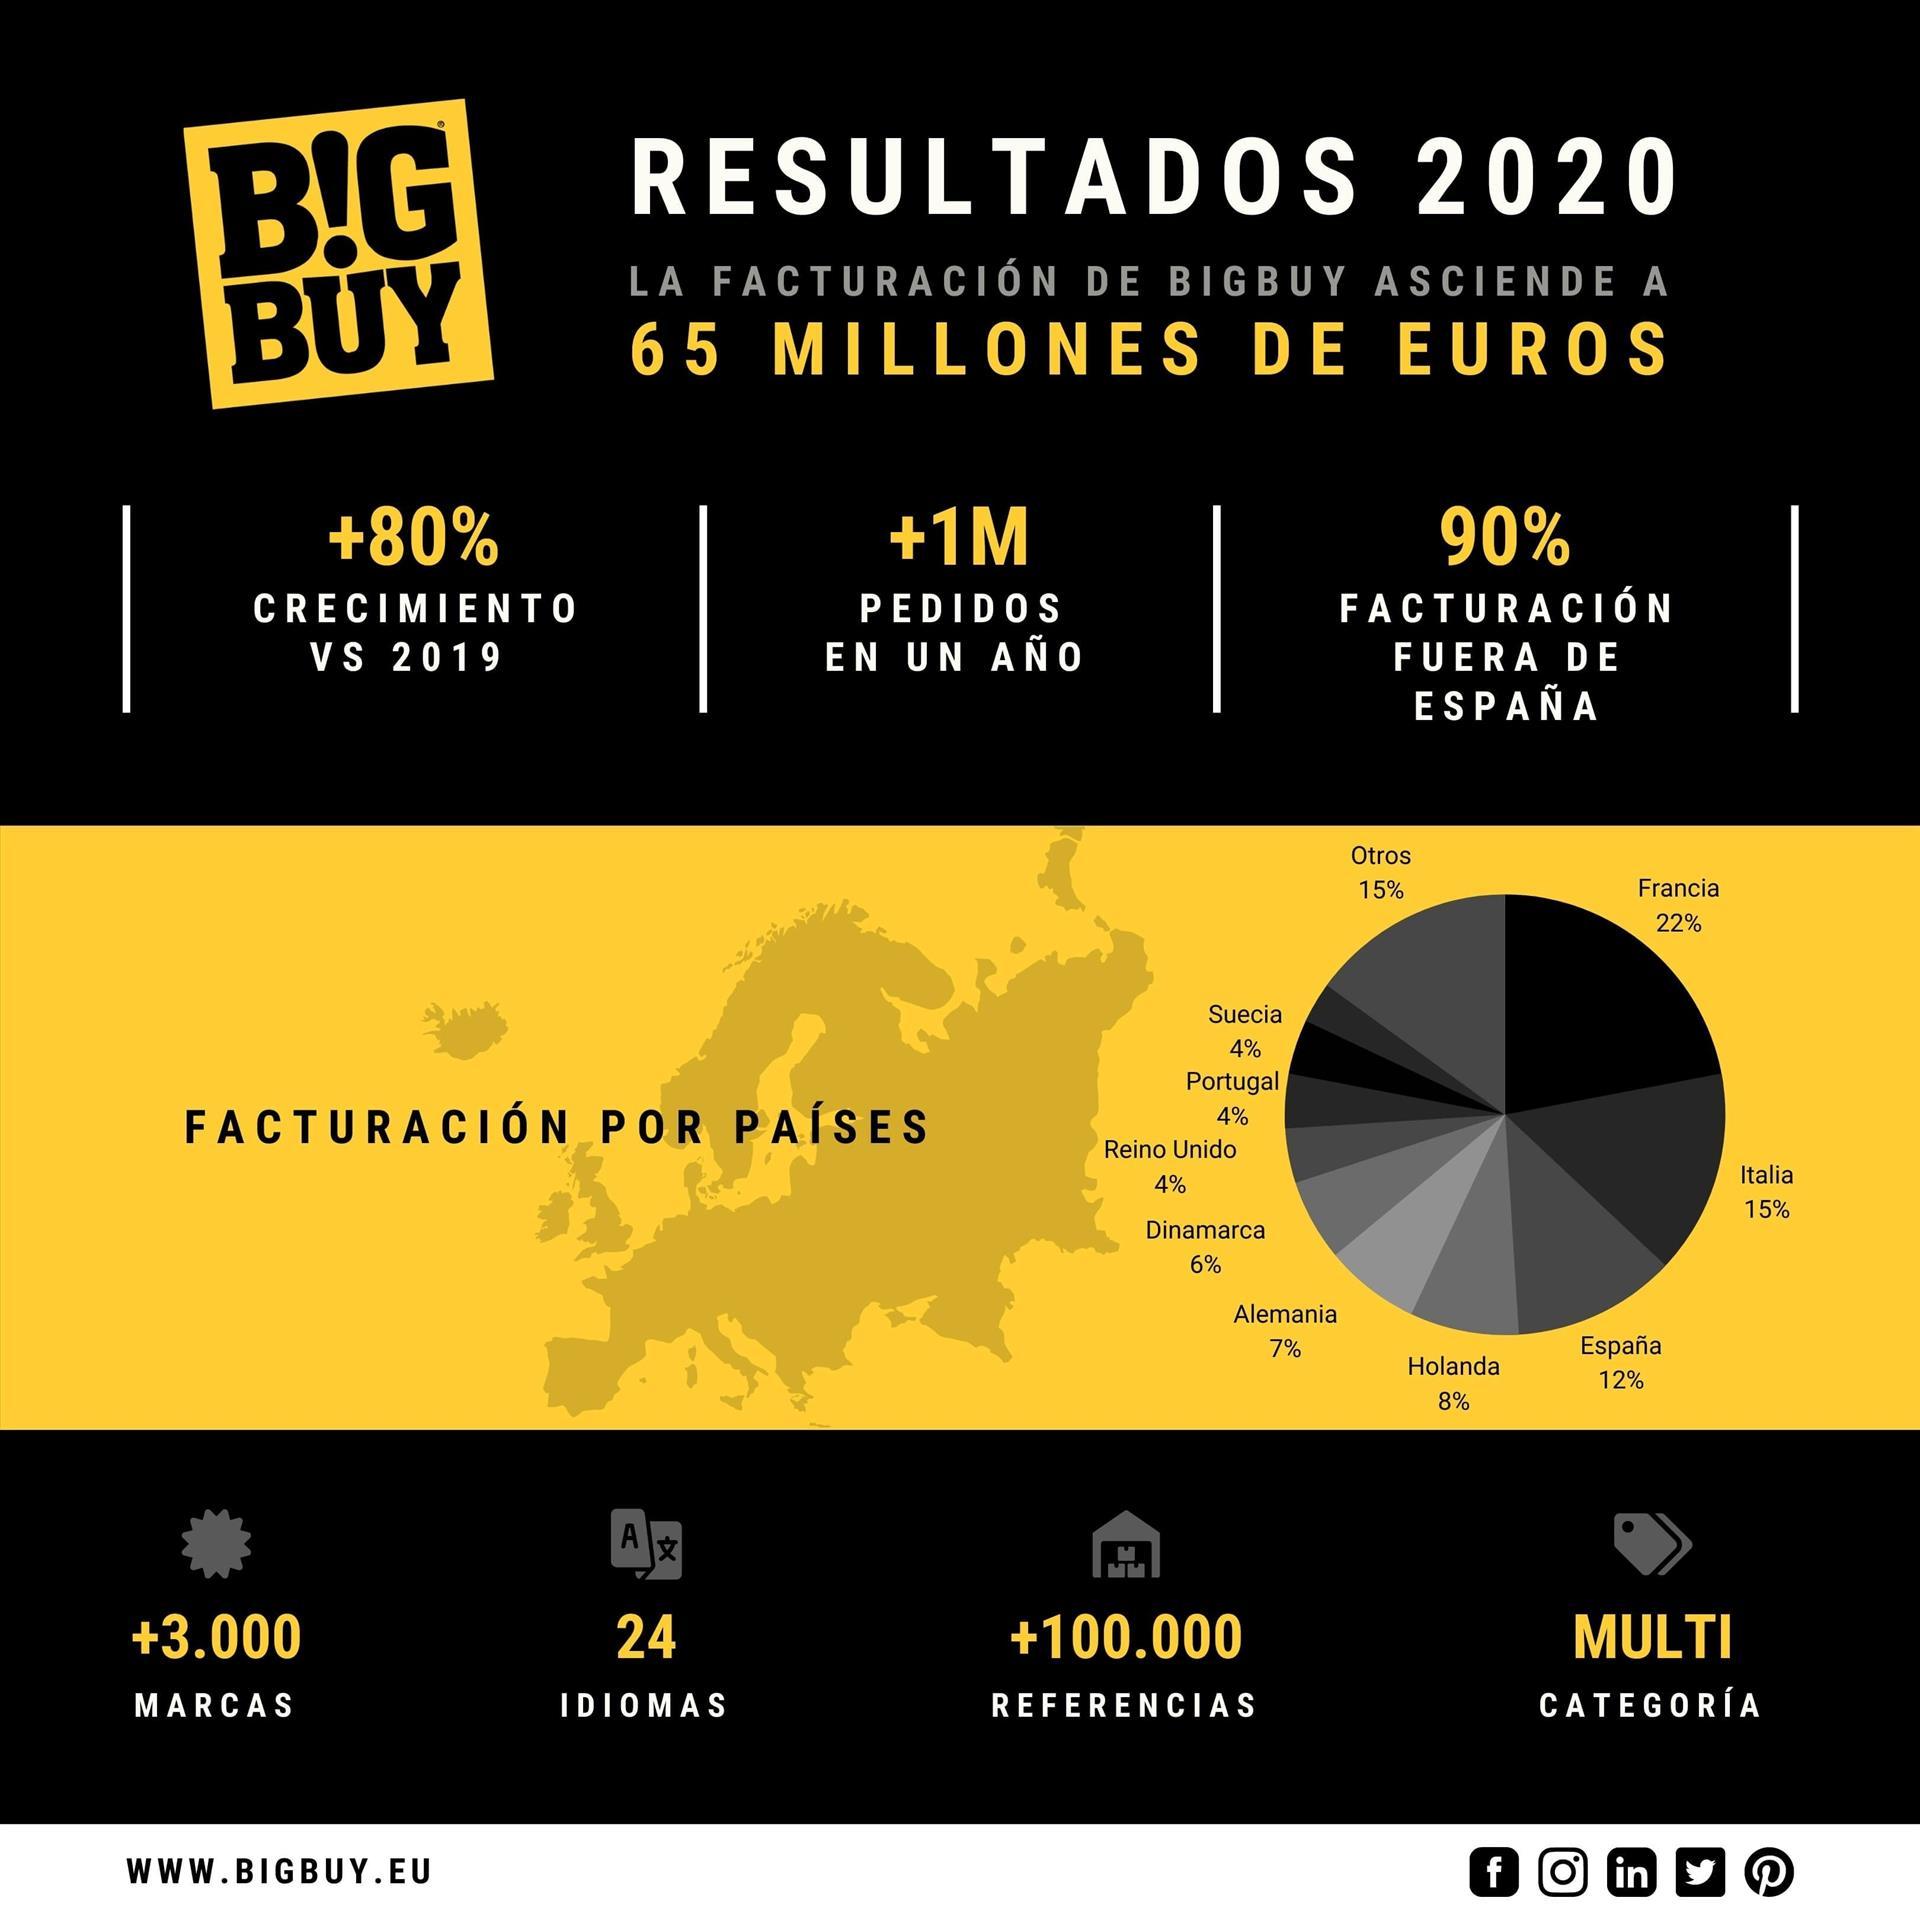 BigBuy - Resultados 2020 / Autor: BigBuy